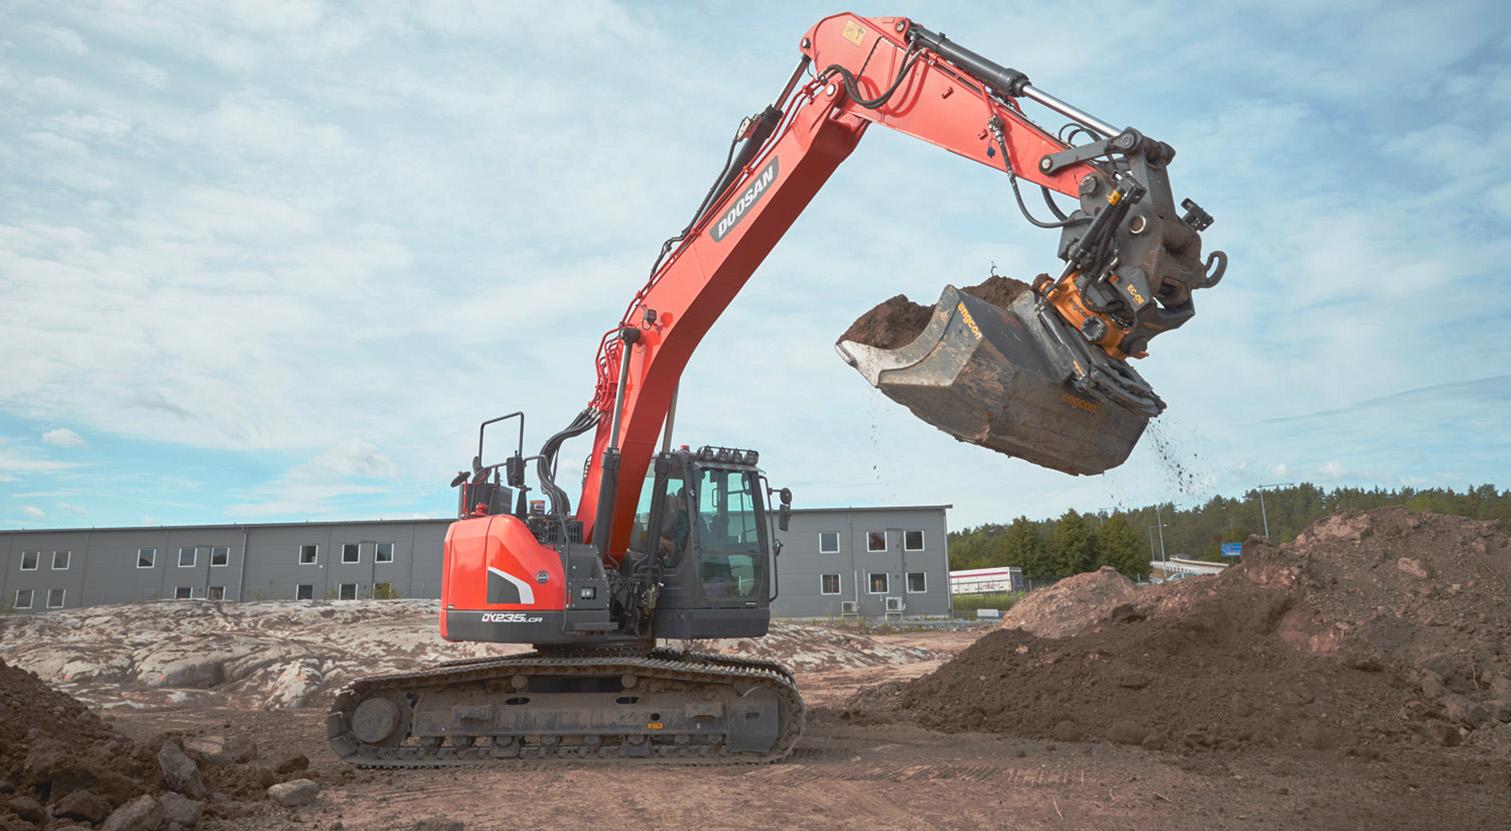 Vi hyr ut grävmaskin i Västra Götaland